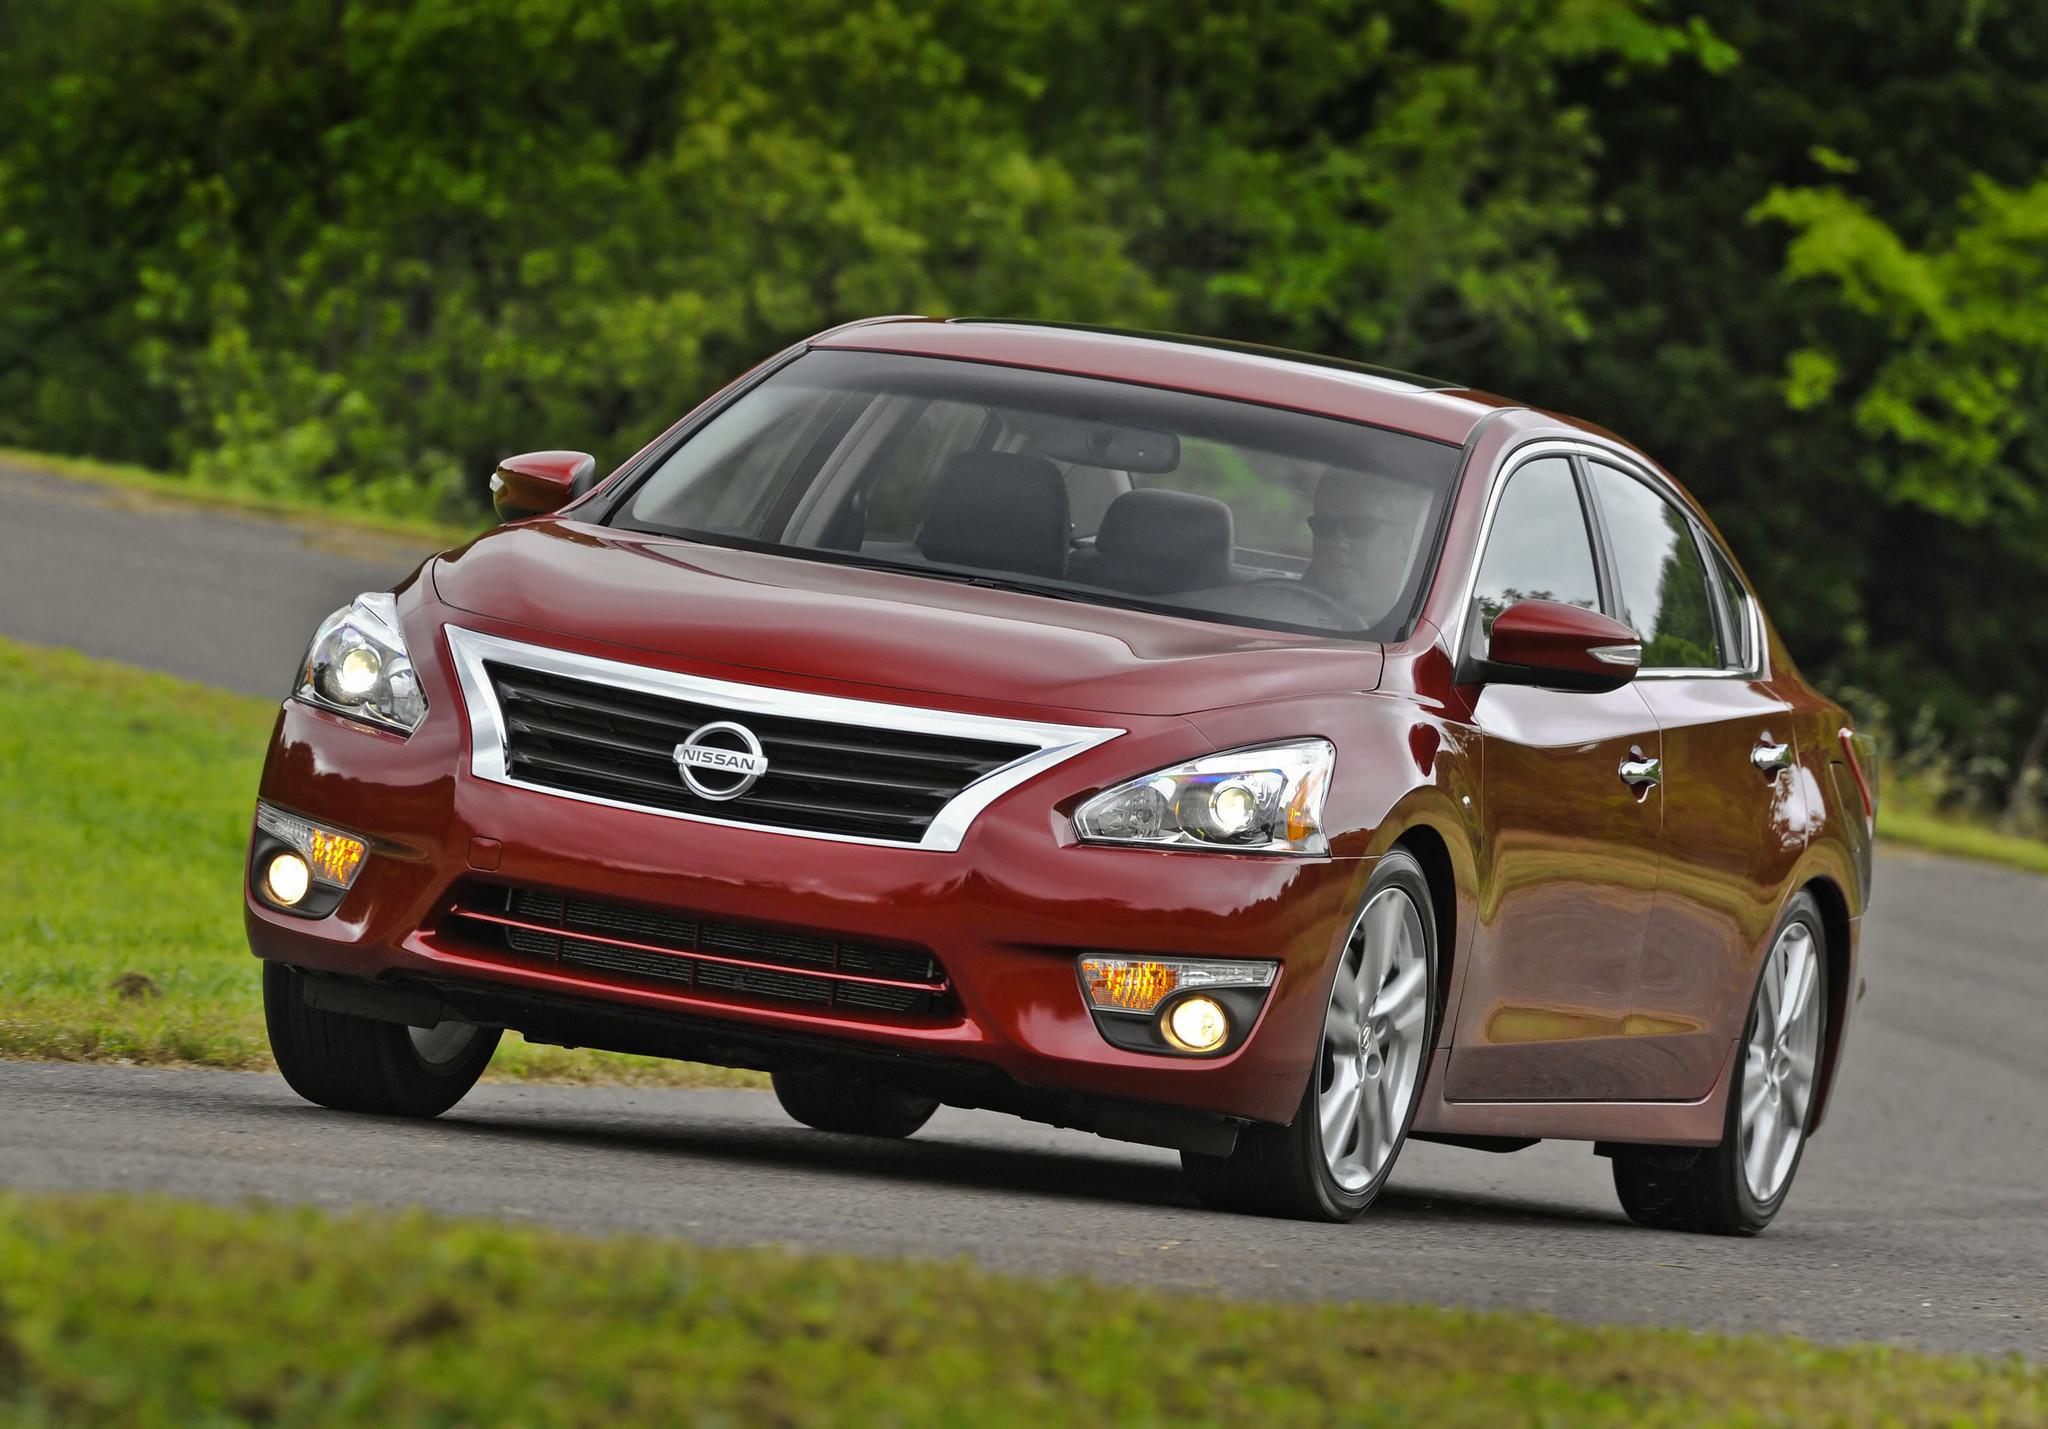 California auto buyers favor Toyota Prius; rest of U.S. prefers trucks